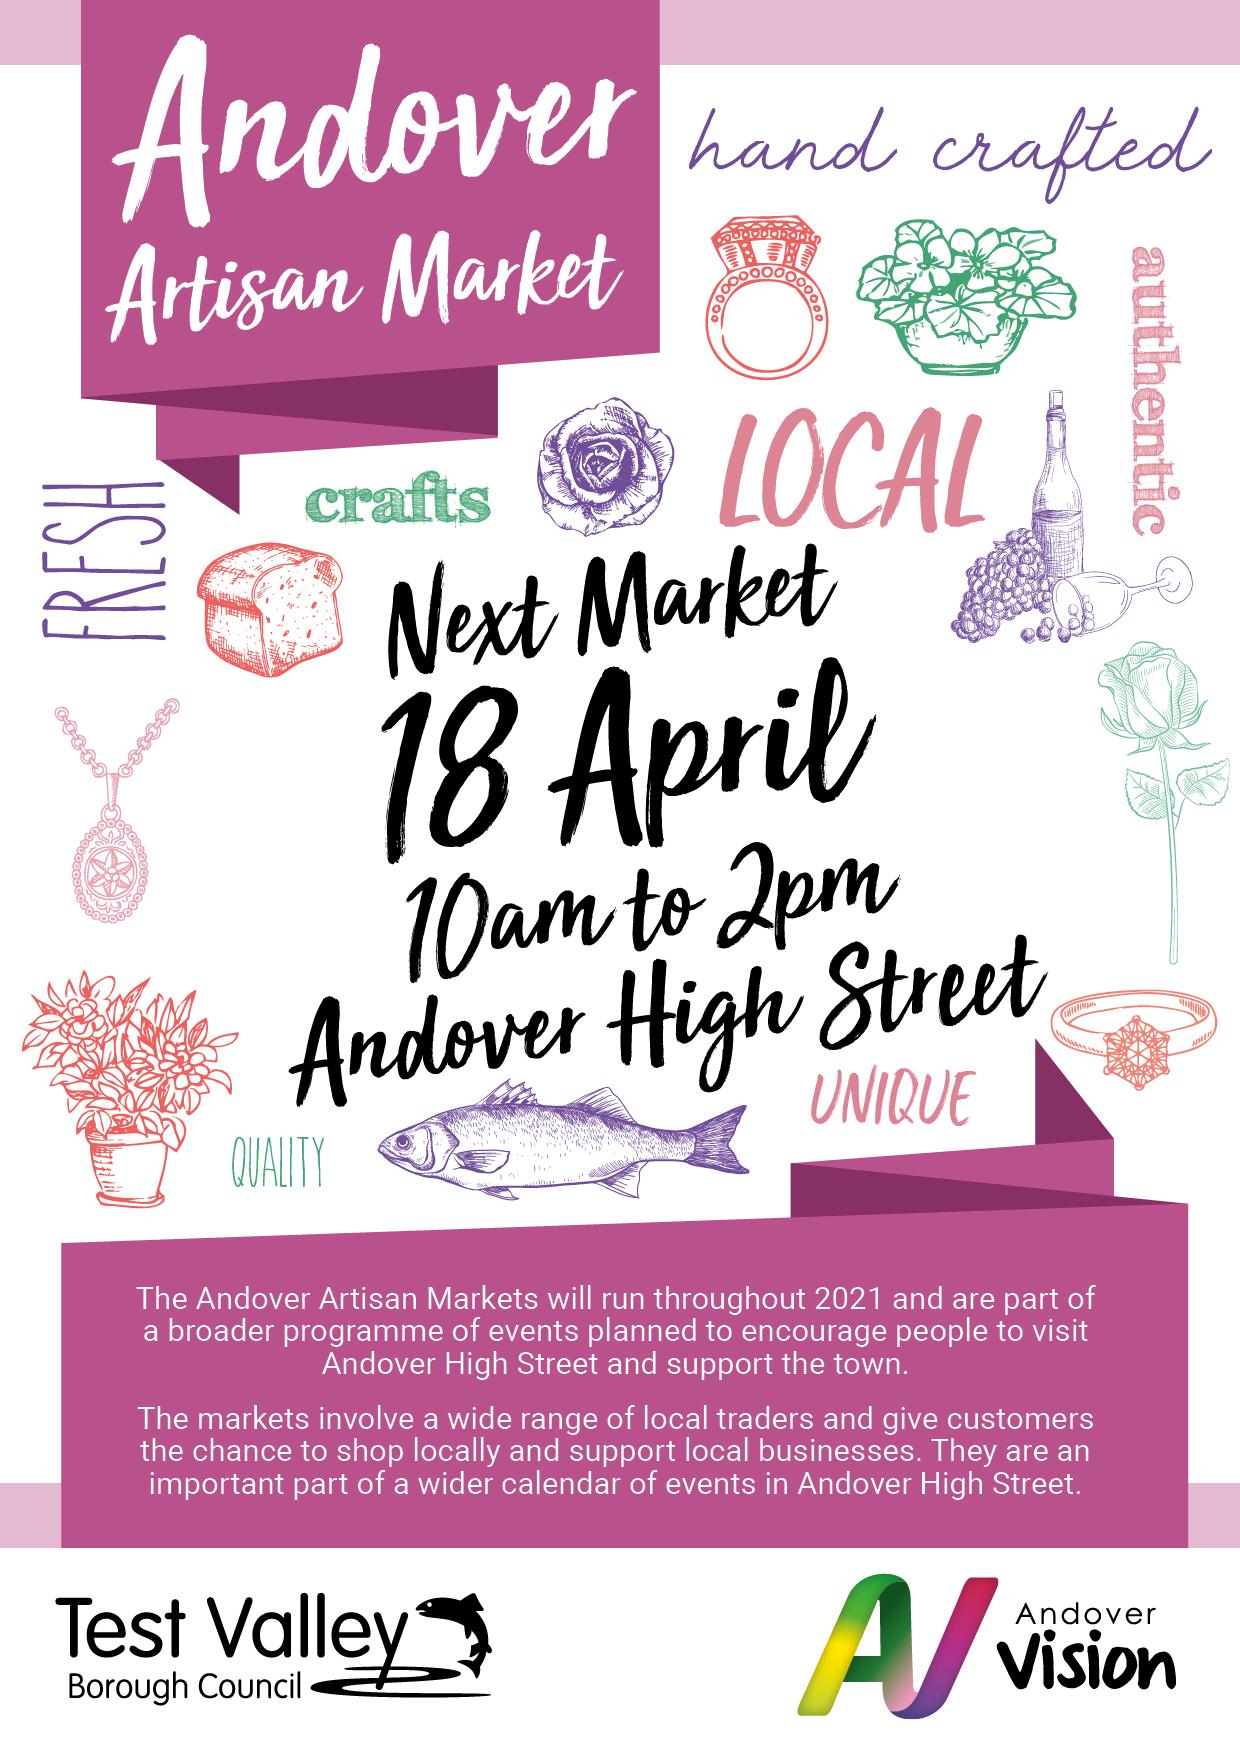 Artisan Market 2021 April